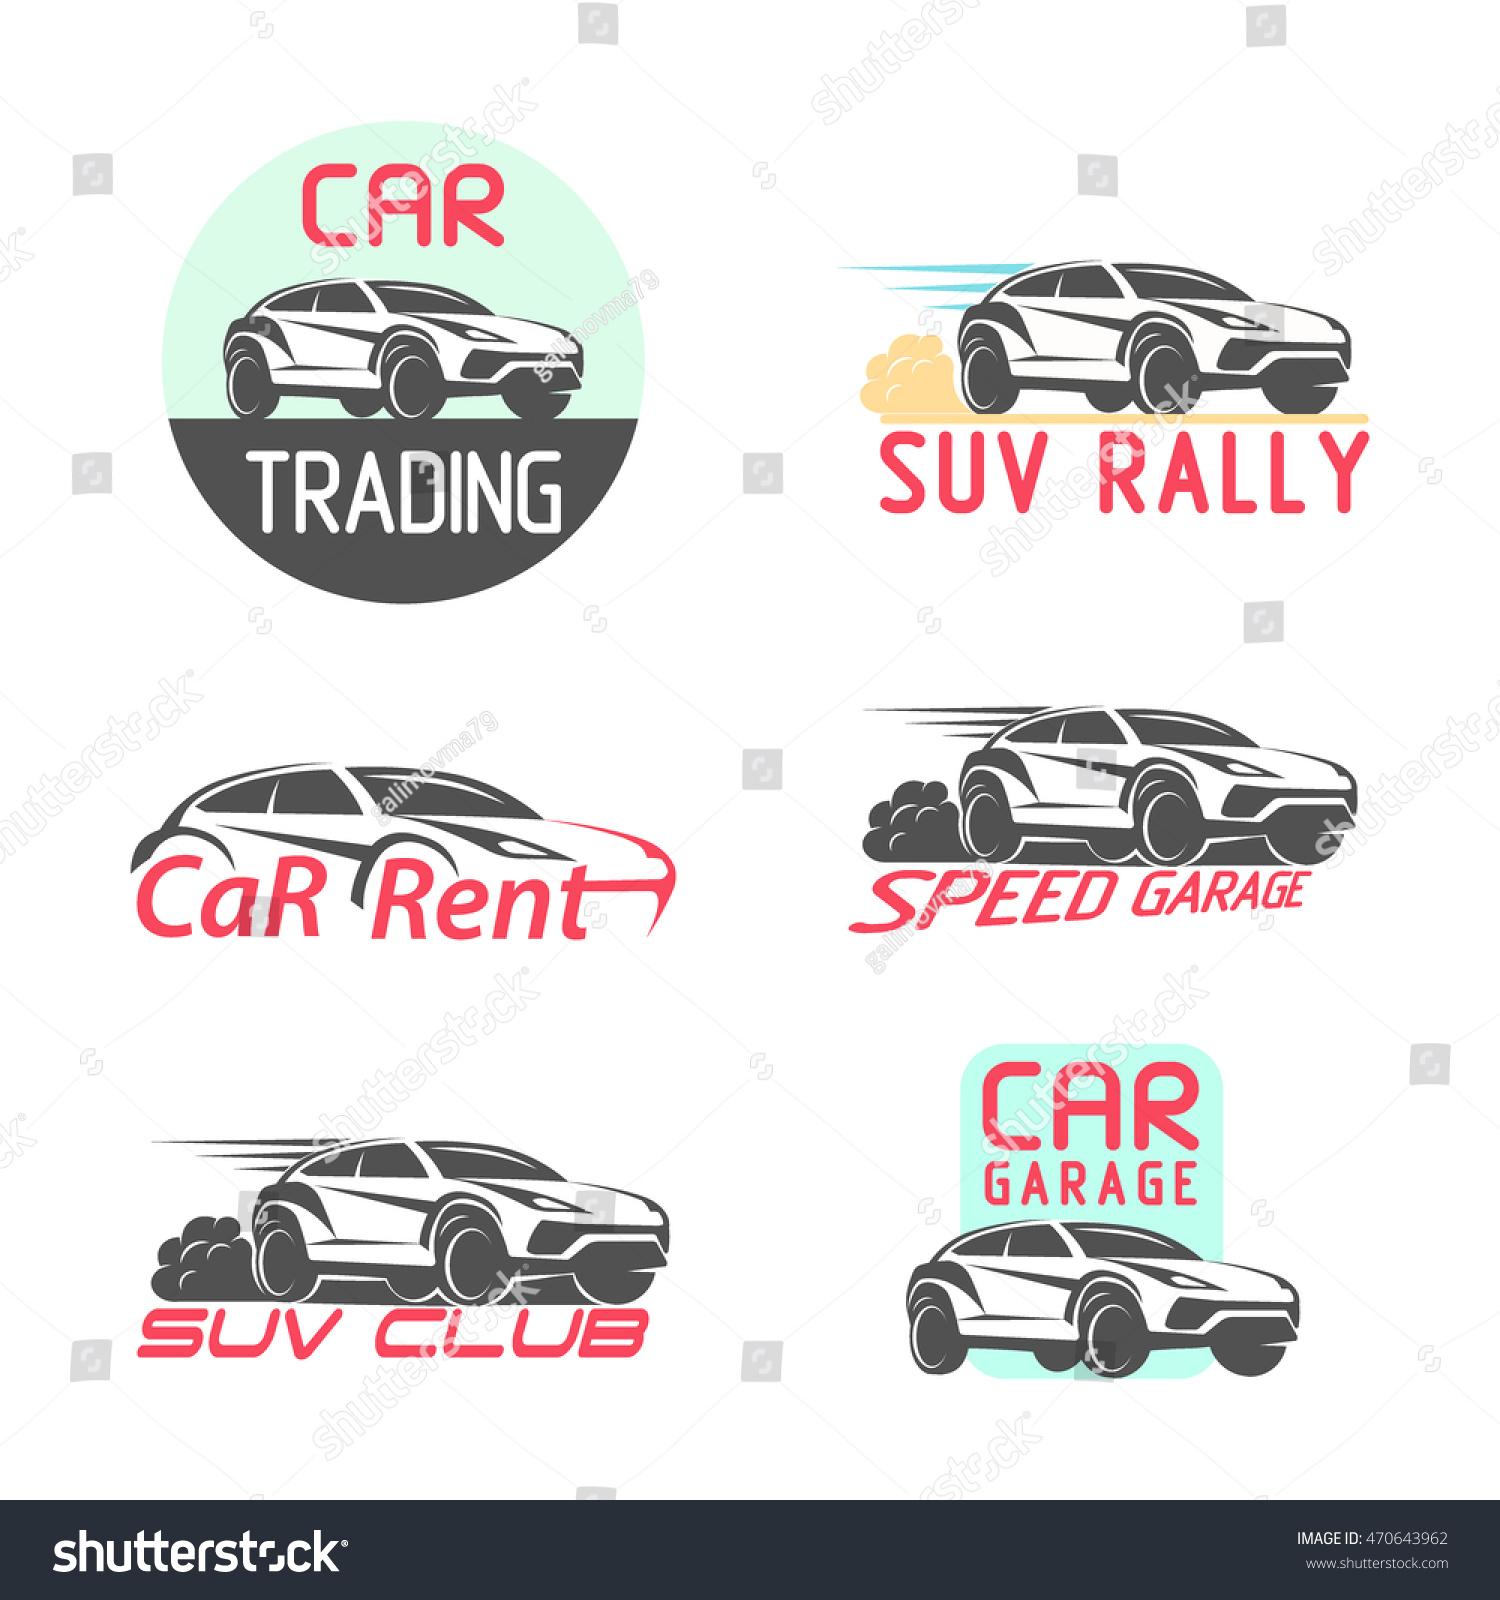 Design car emblem - Car Logo Emblem Template Design Vector Illustration